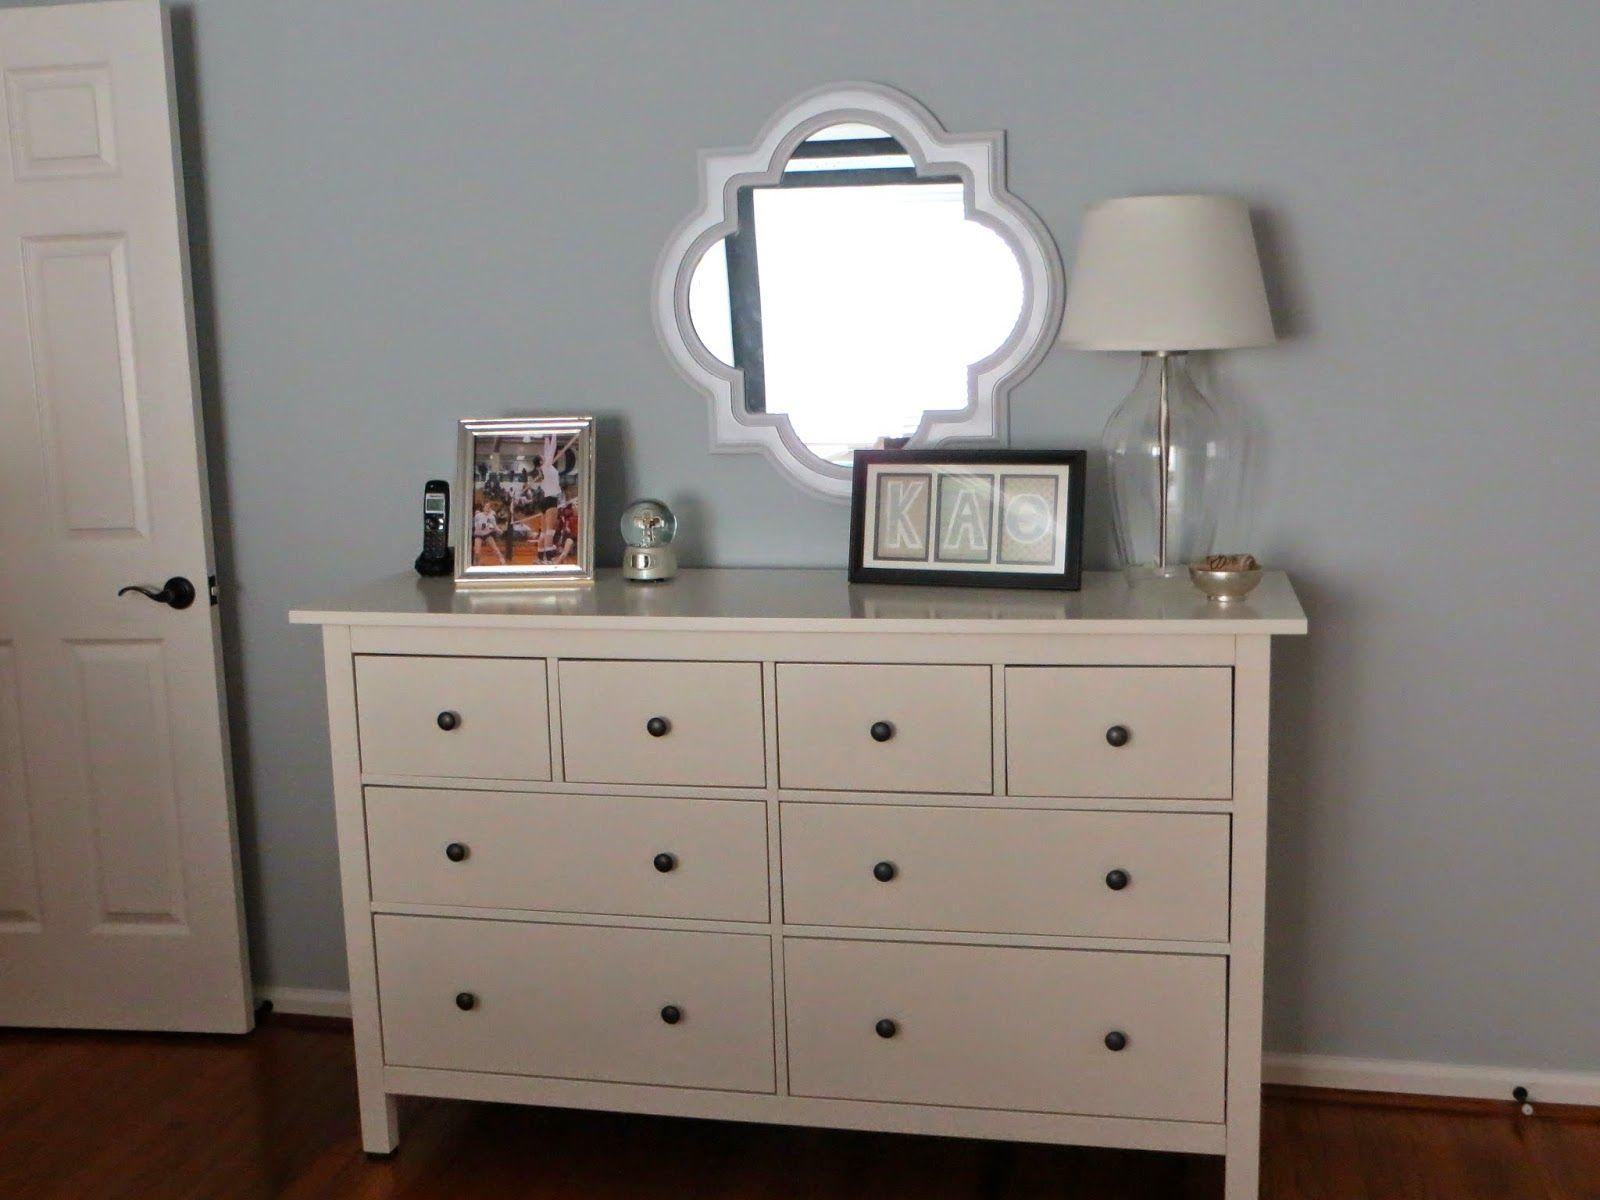 Ikea Hemnes 3 Drawer Dresser Dresser Design Small Dresser